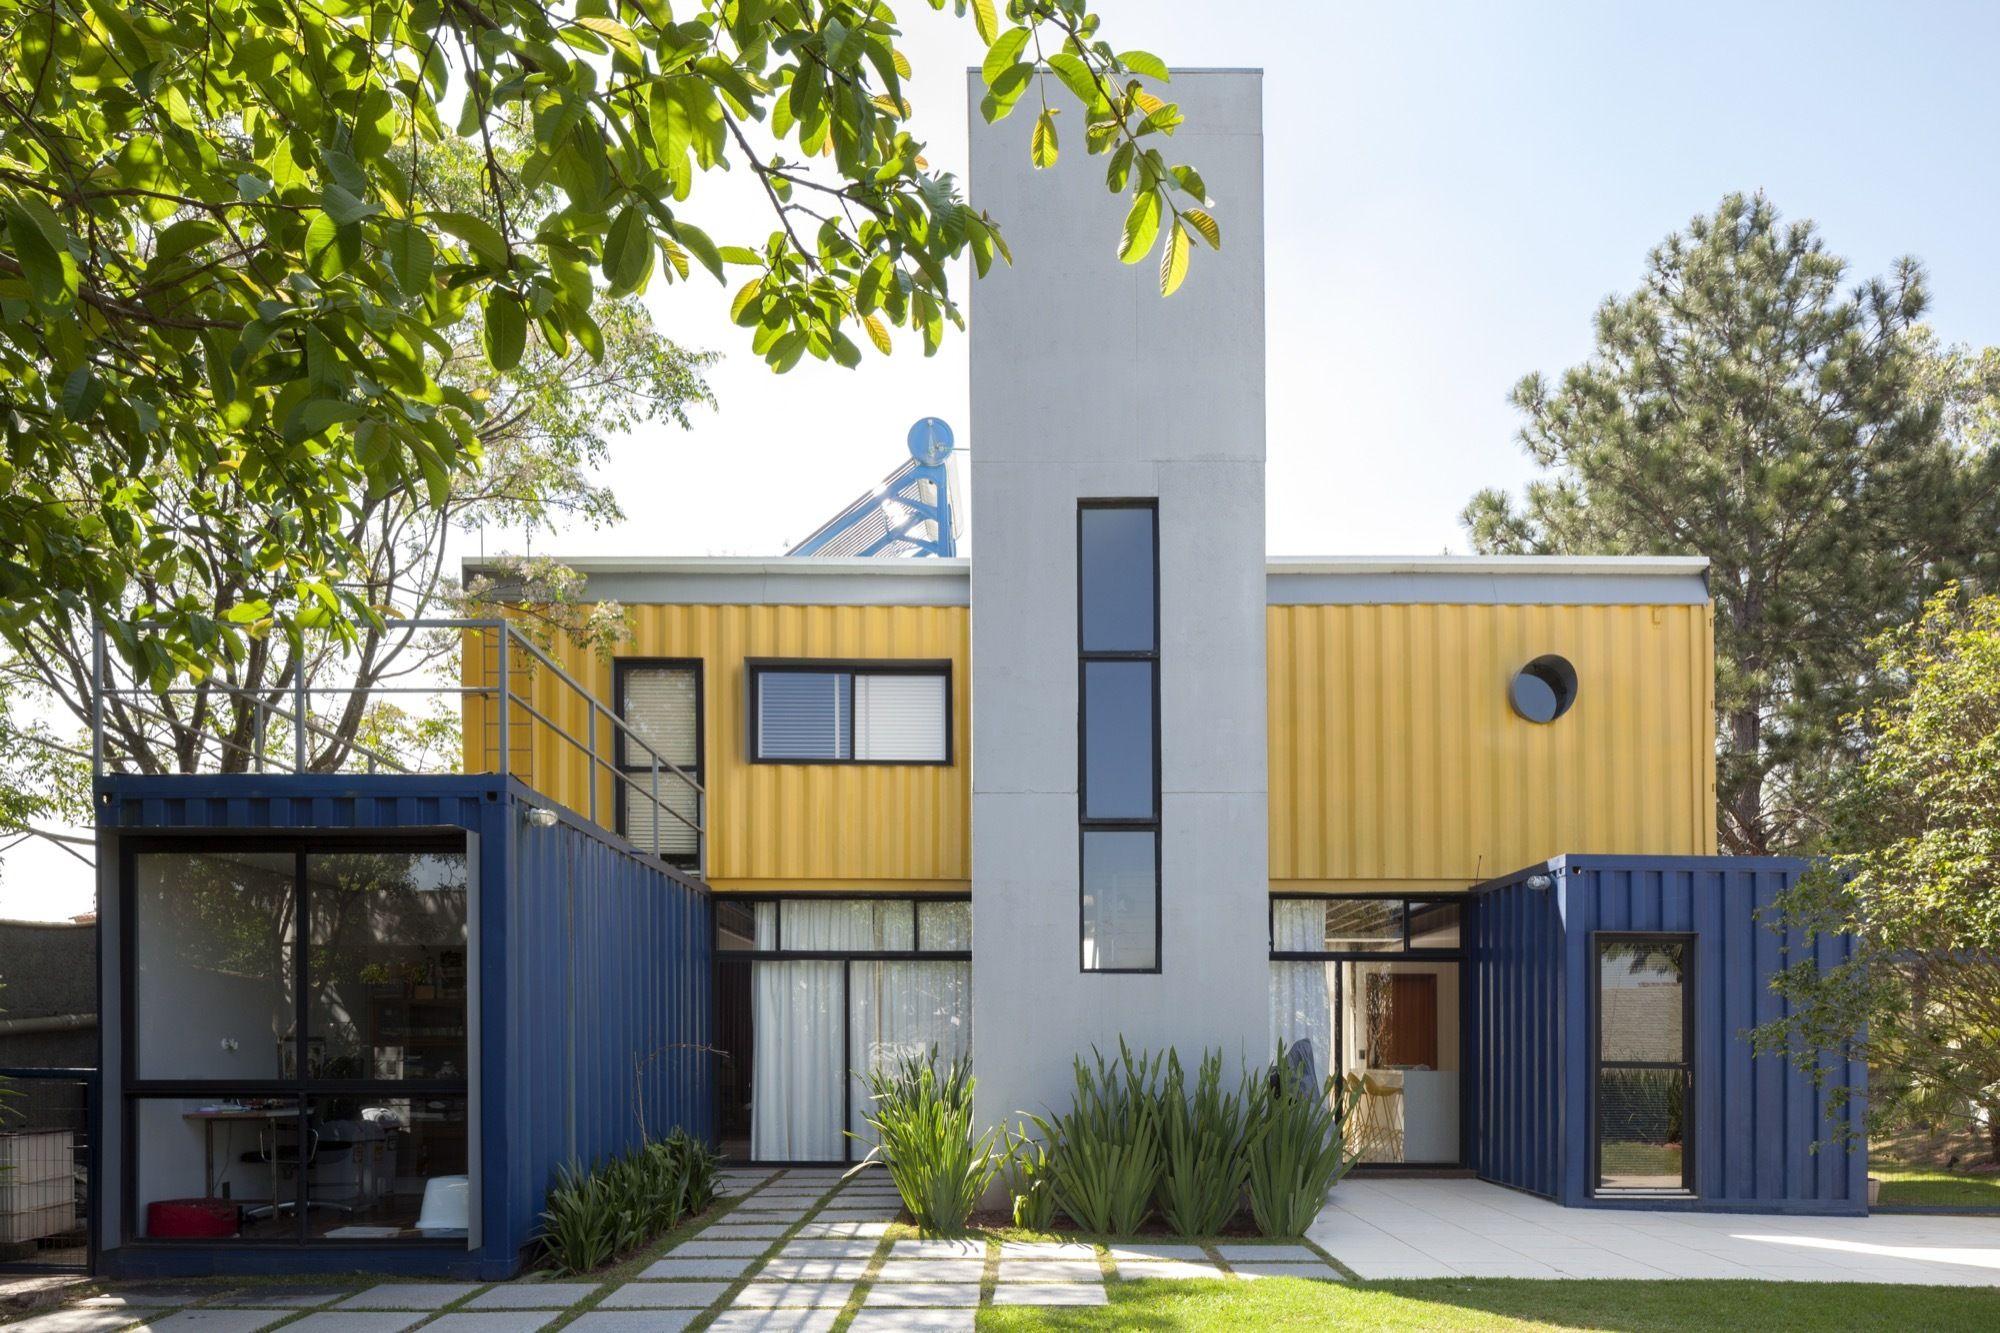 Casa Container Granja Viana / Container Box   Pinterest